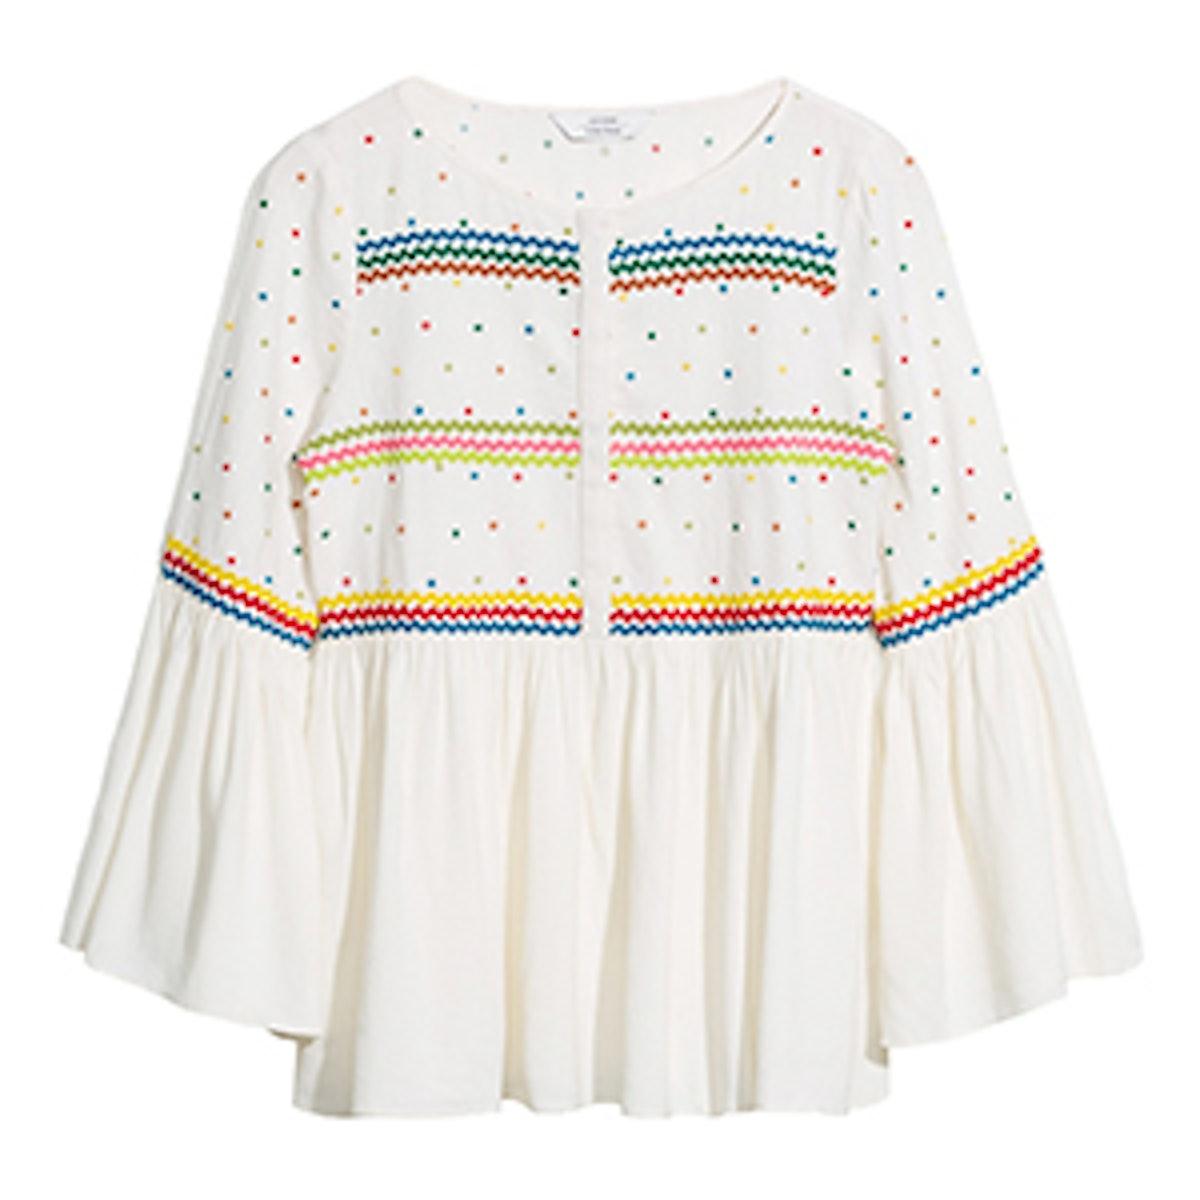 Linen-Blend Rik Rak & Embroidered Blouse